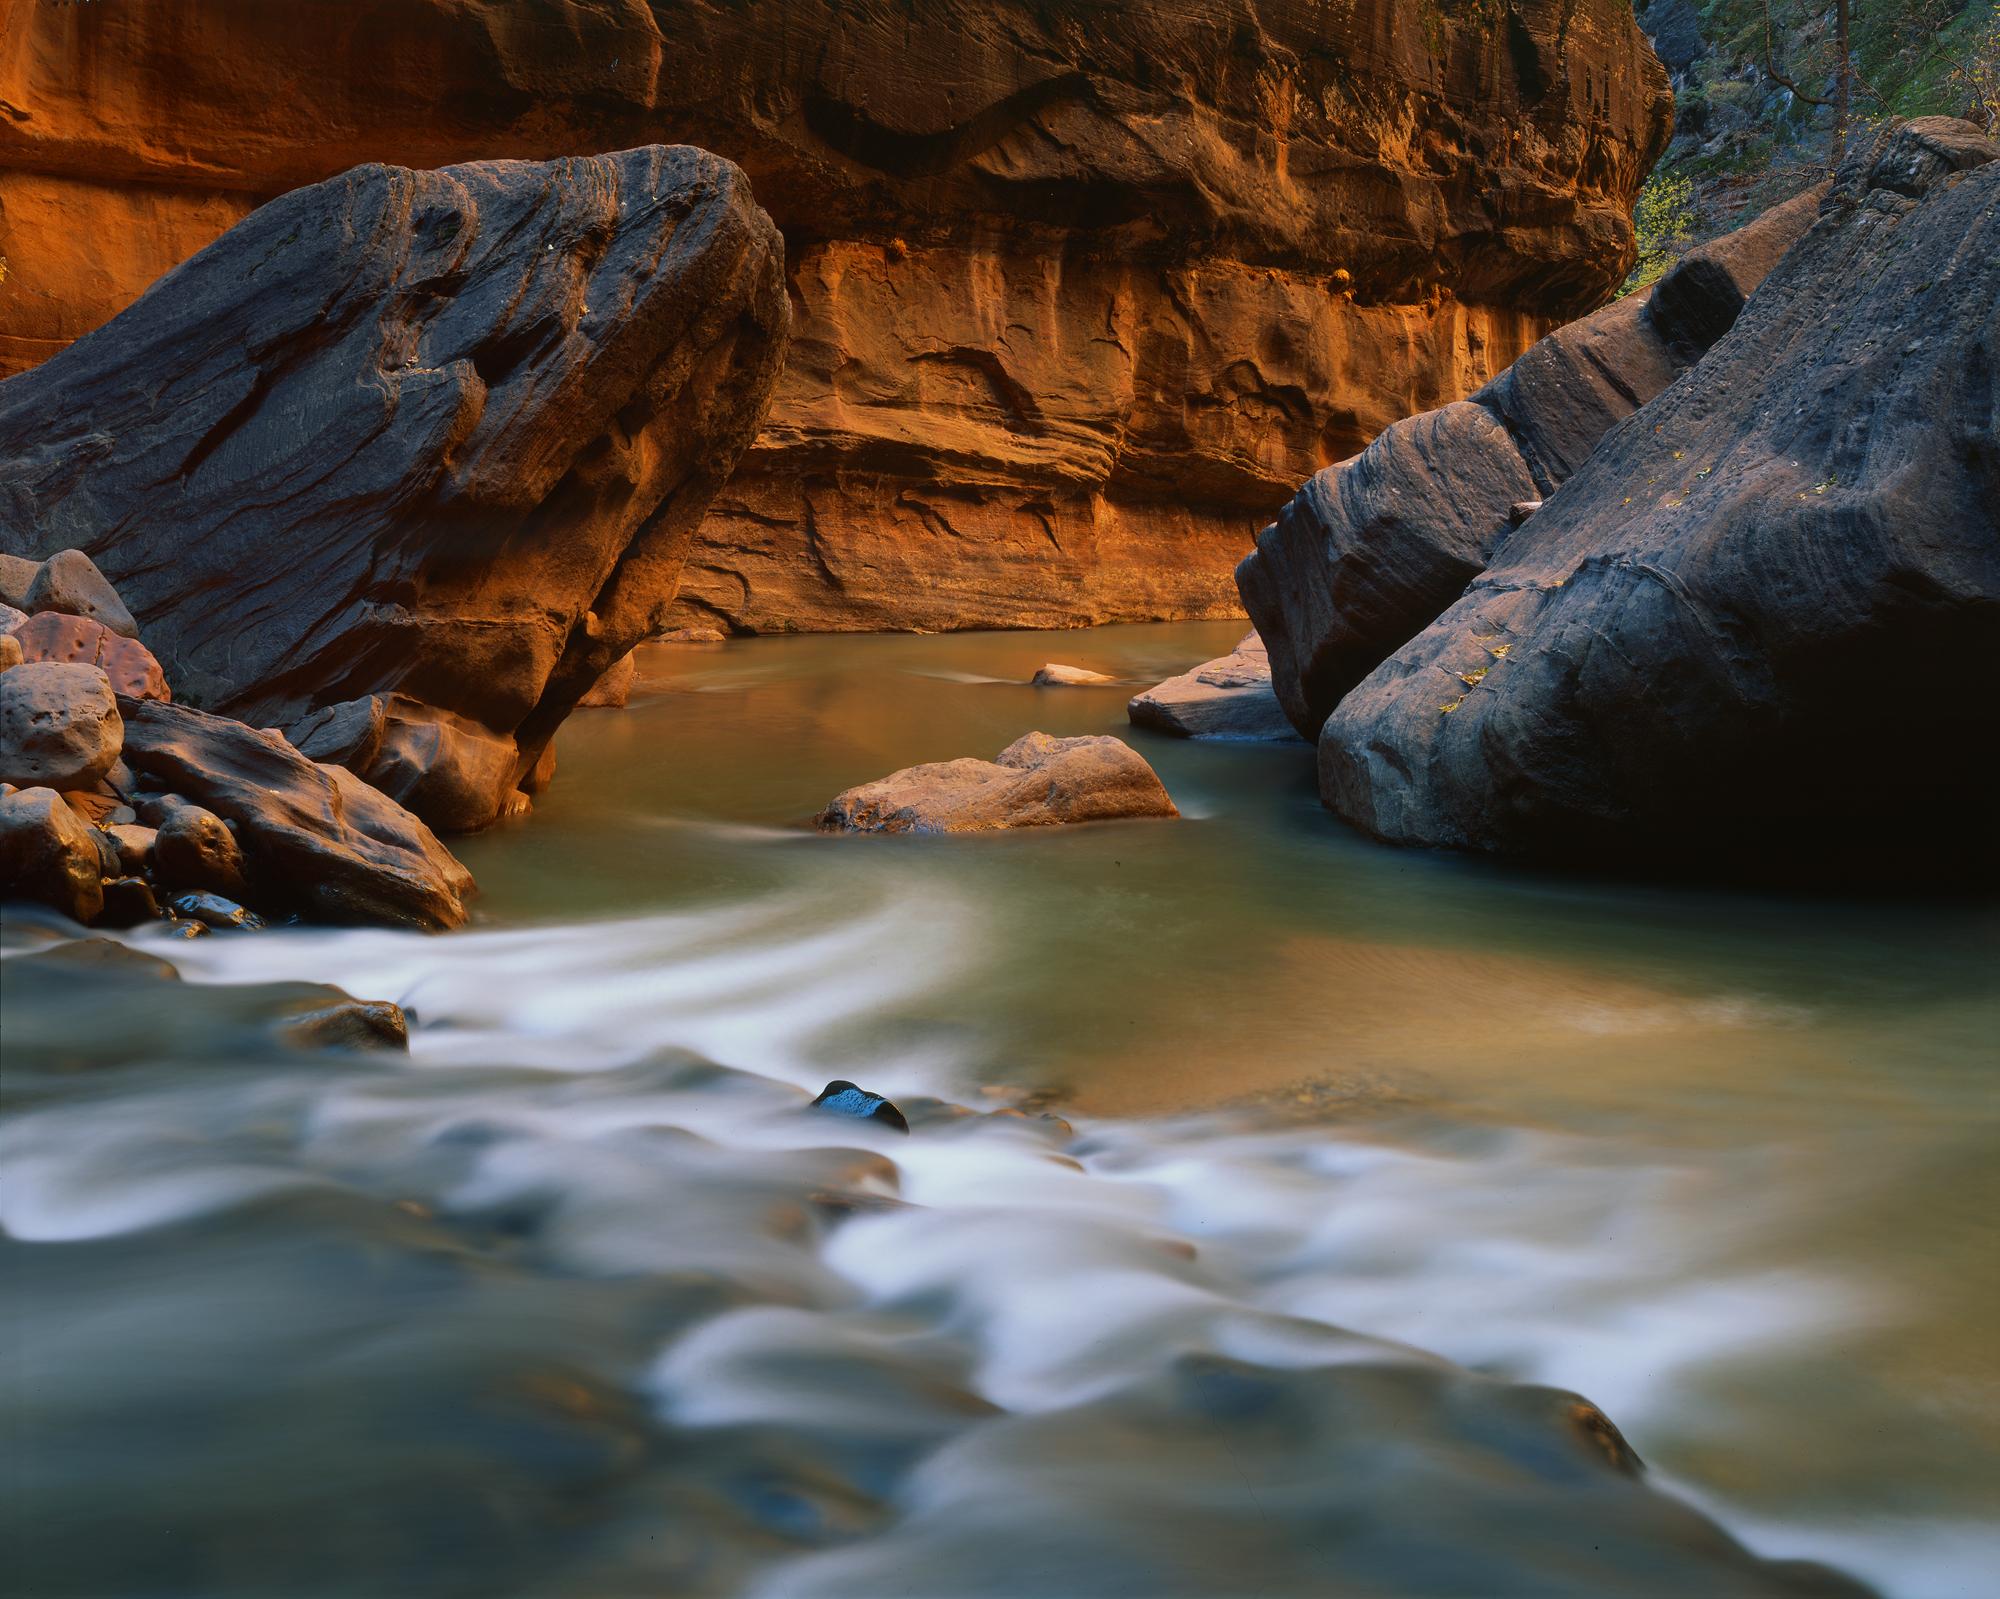 Between Two Rocks  | Zion National Park, Utah